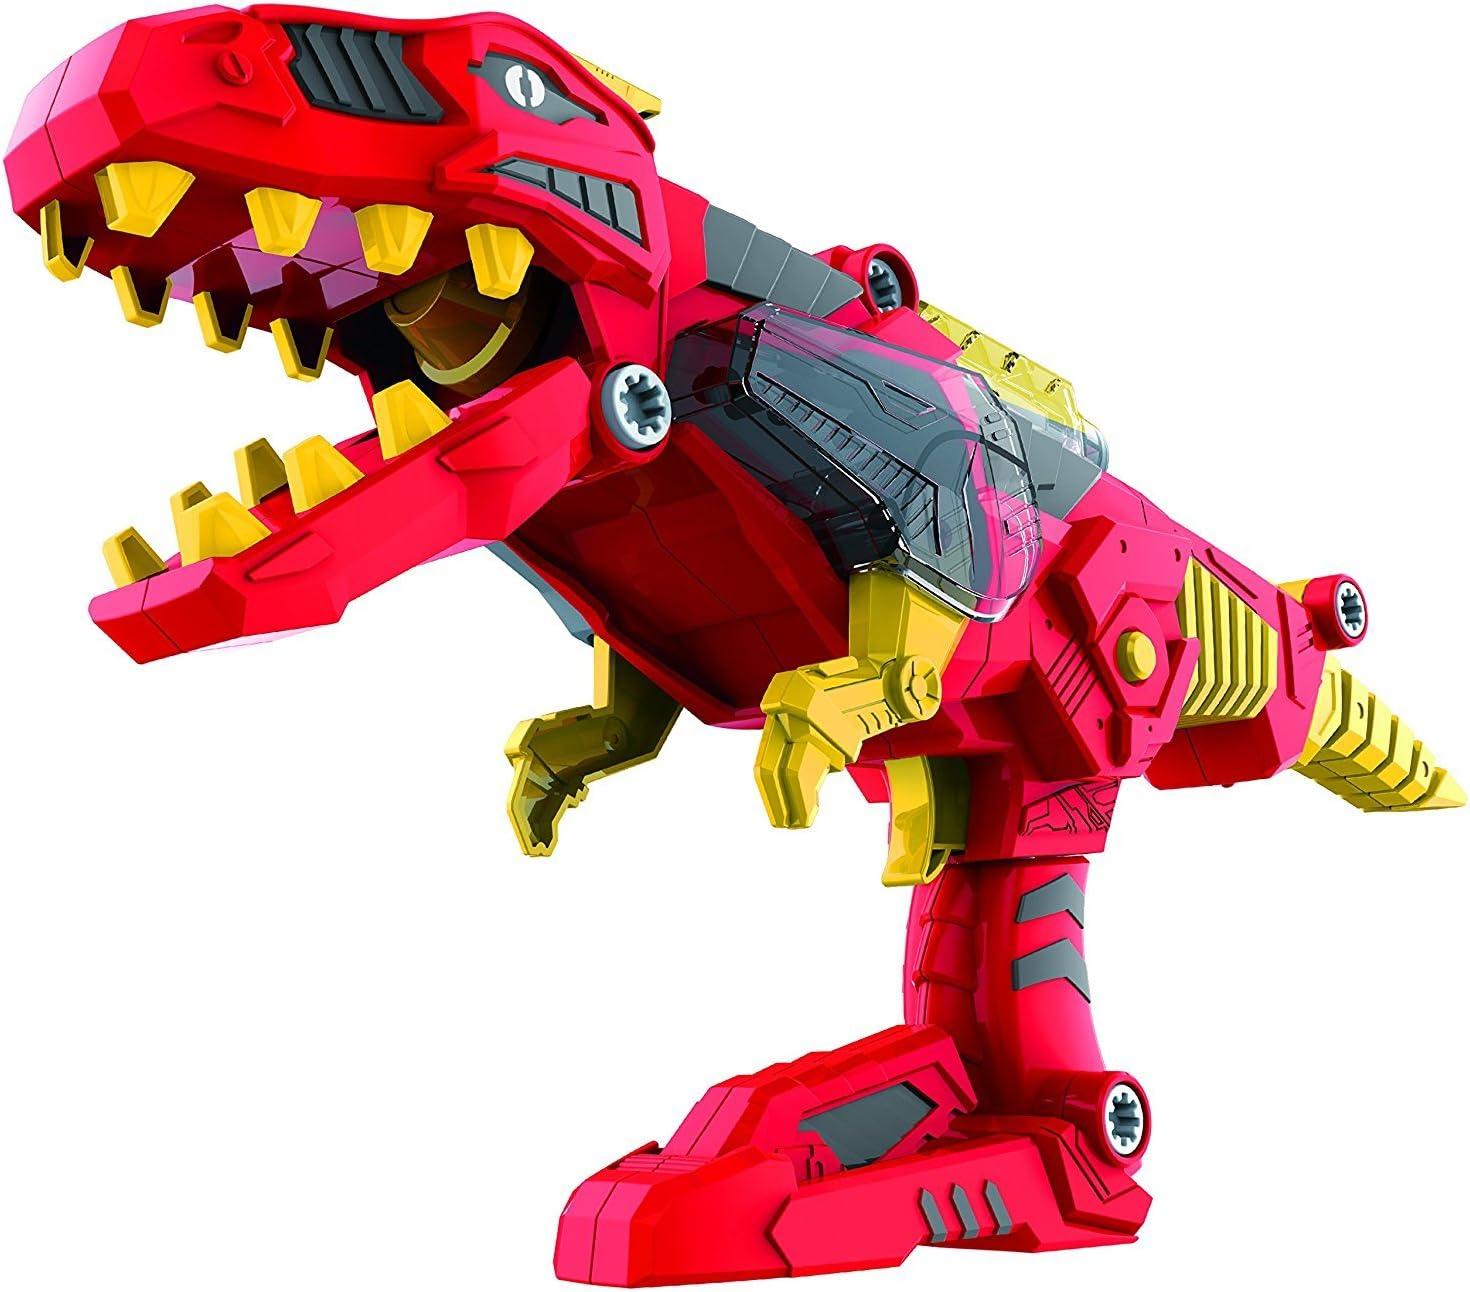 DinoBlaster 2 in 1 Transforming Dinosaur Toy Gun TG662 – Build & Take Apart Cool Tyrannosaurus Rex Dinosaur Toy for Boys & Girls Age 3 4 5 by ThinkGizmos (Trademark Protected)